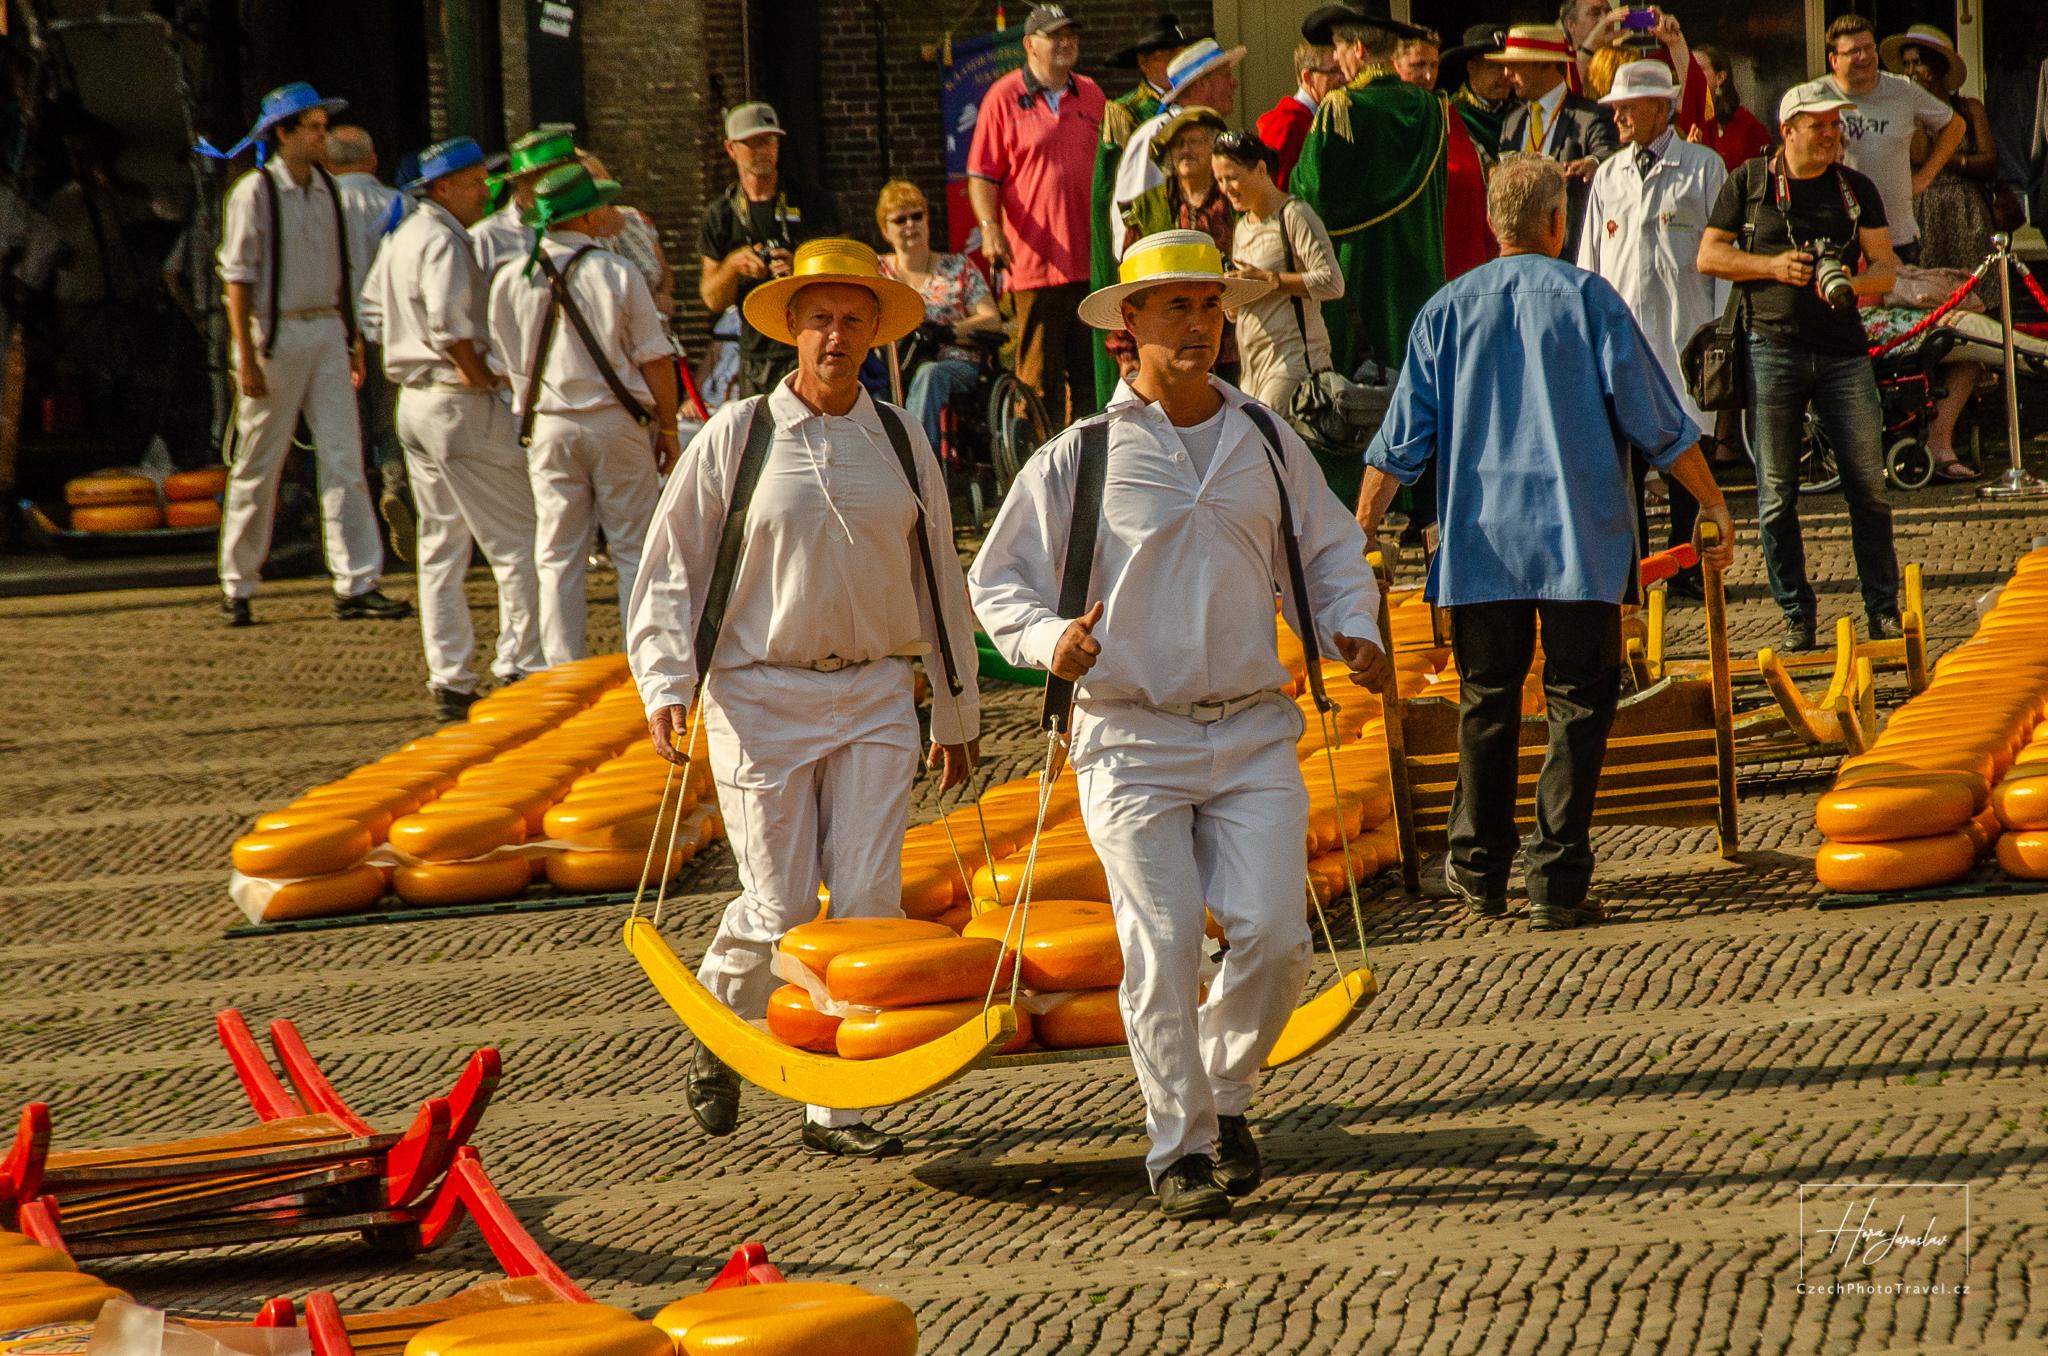 Fotoexpedice Holandsko - trhy